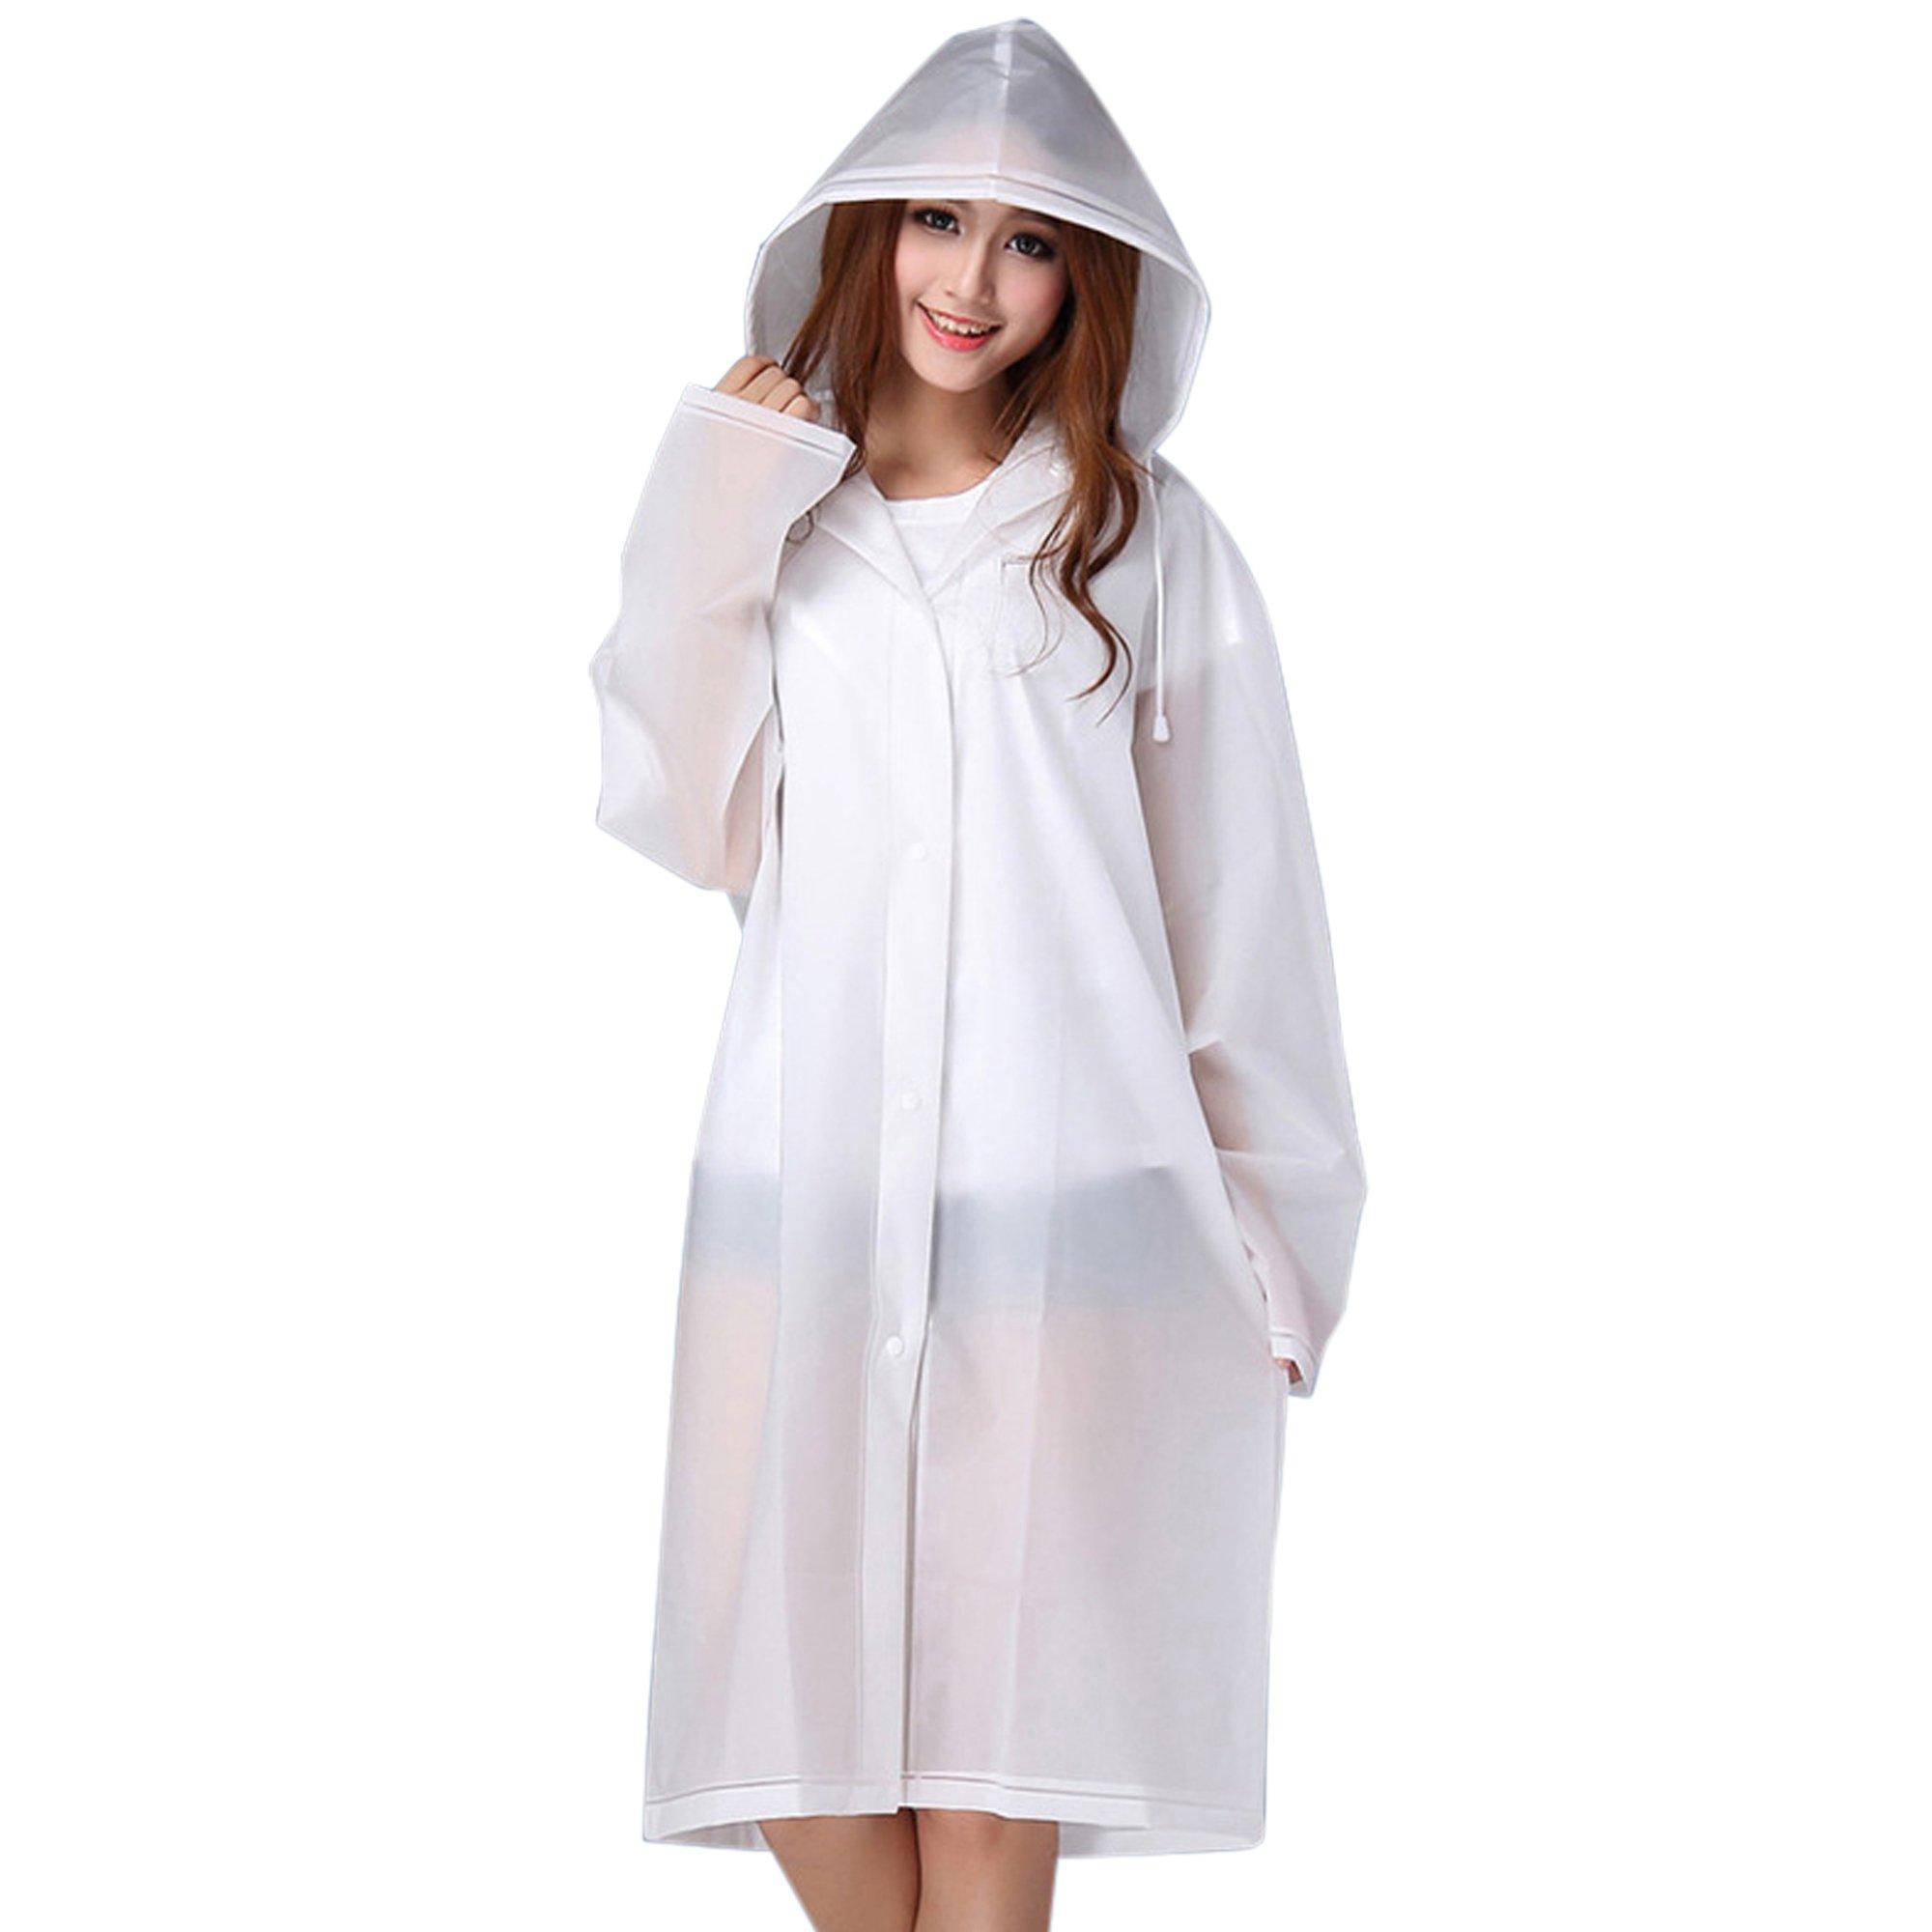 Durable EVA Adult Portable Raincoat Rain Poncho with Hoods and Sleeves